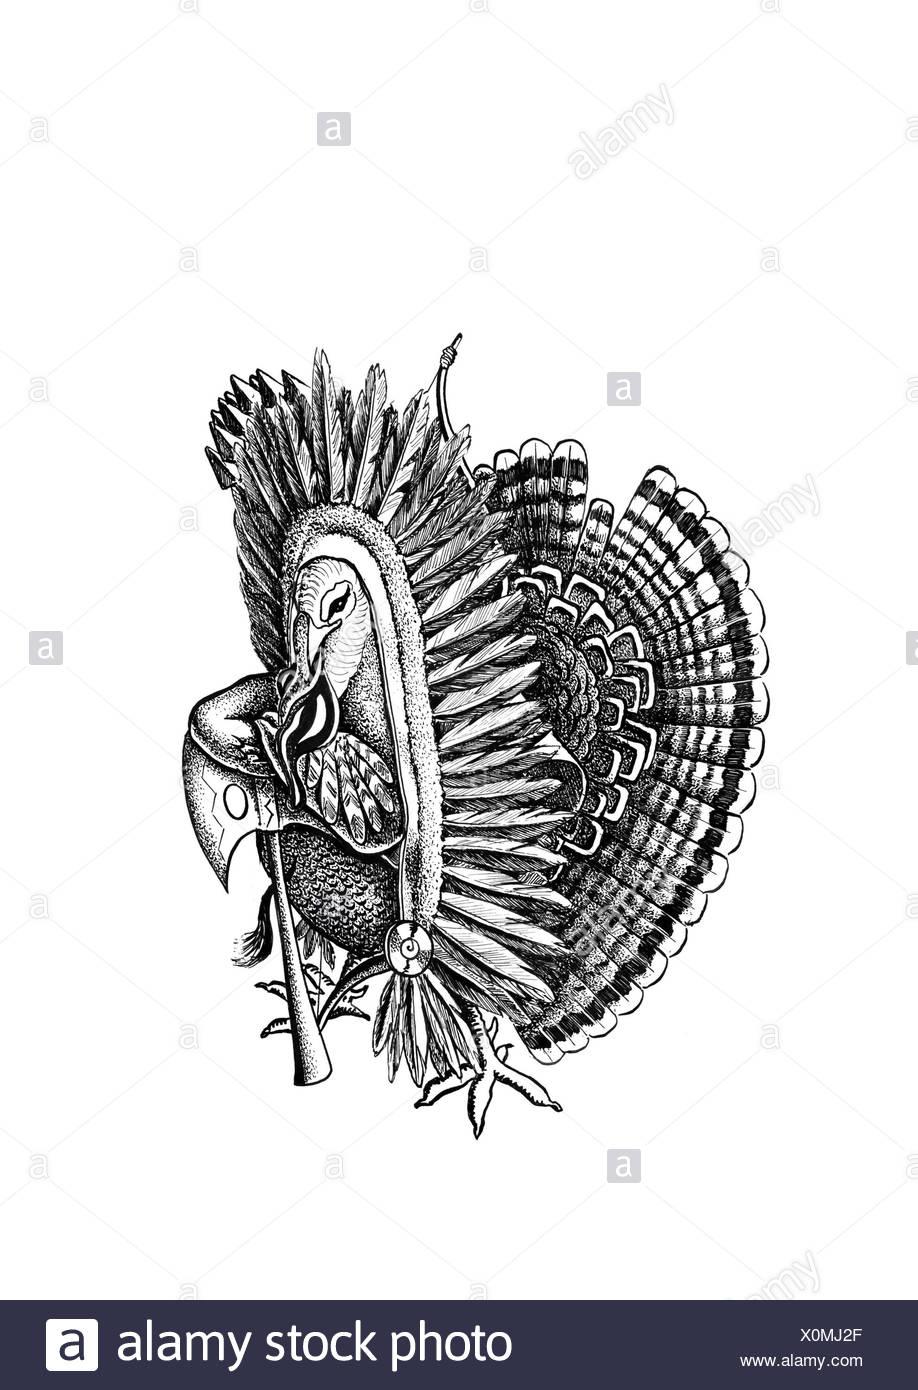 Turkey with Indian's headdress - Stock Image